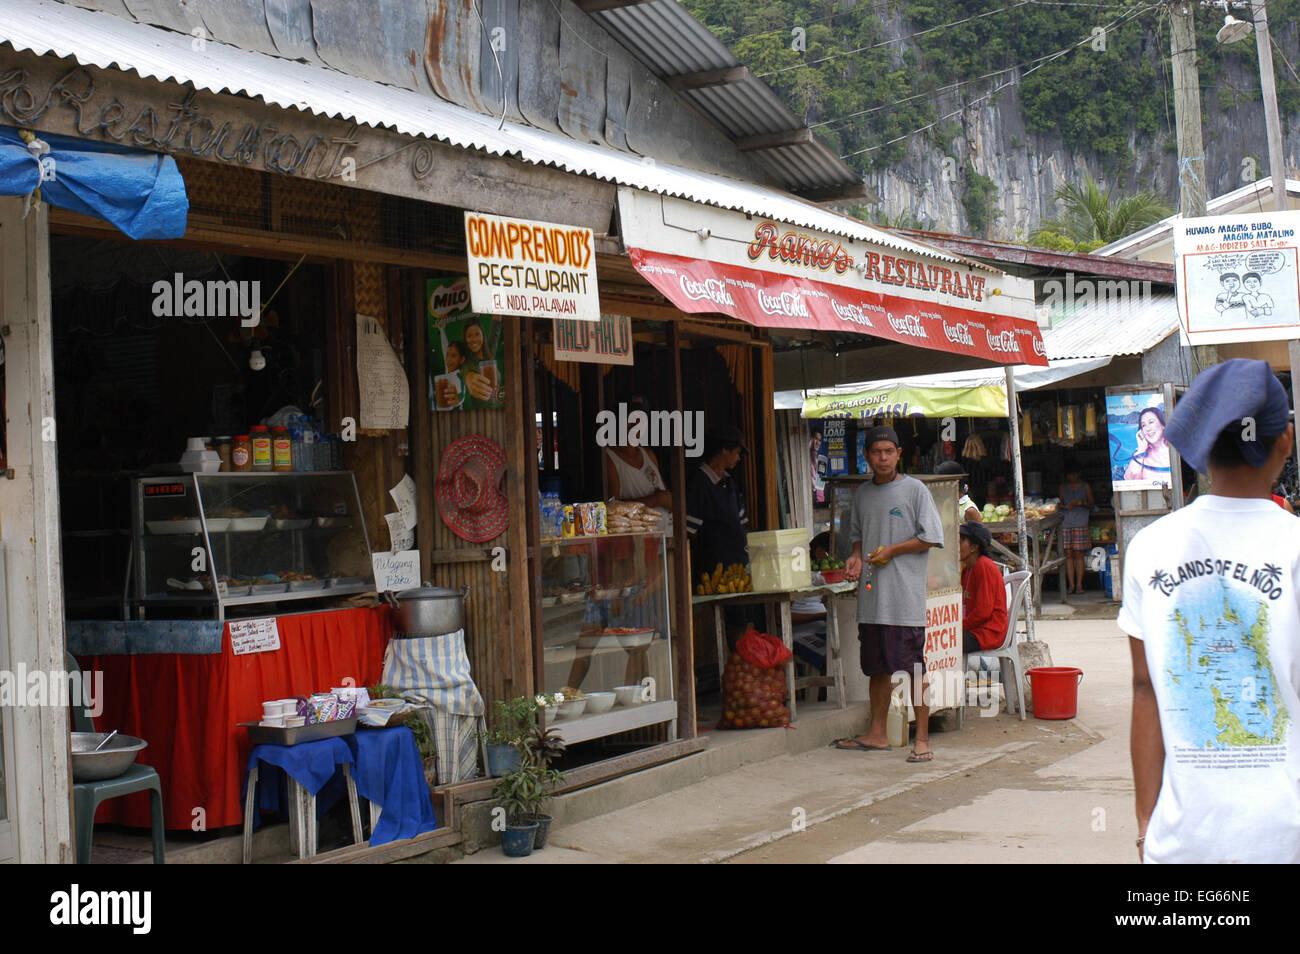 Bar, restaurants. Streets of the village El Nido. Philippines. El Nido (officially the Municipality of El Nido) - Stock Image